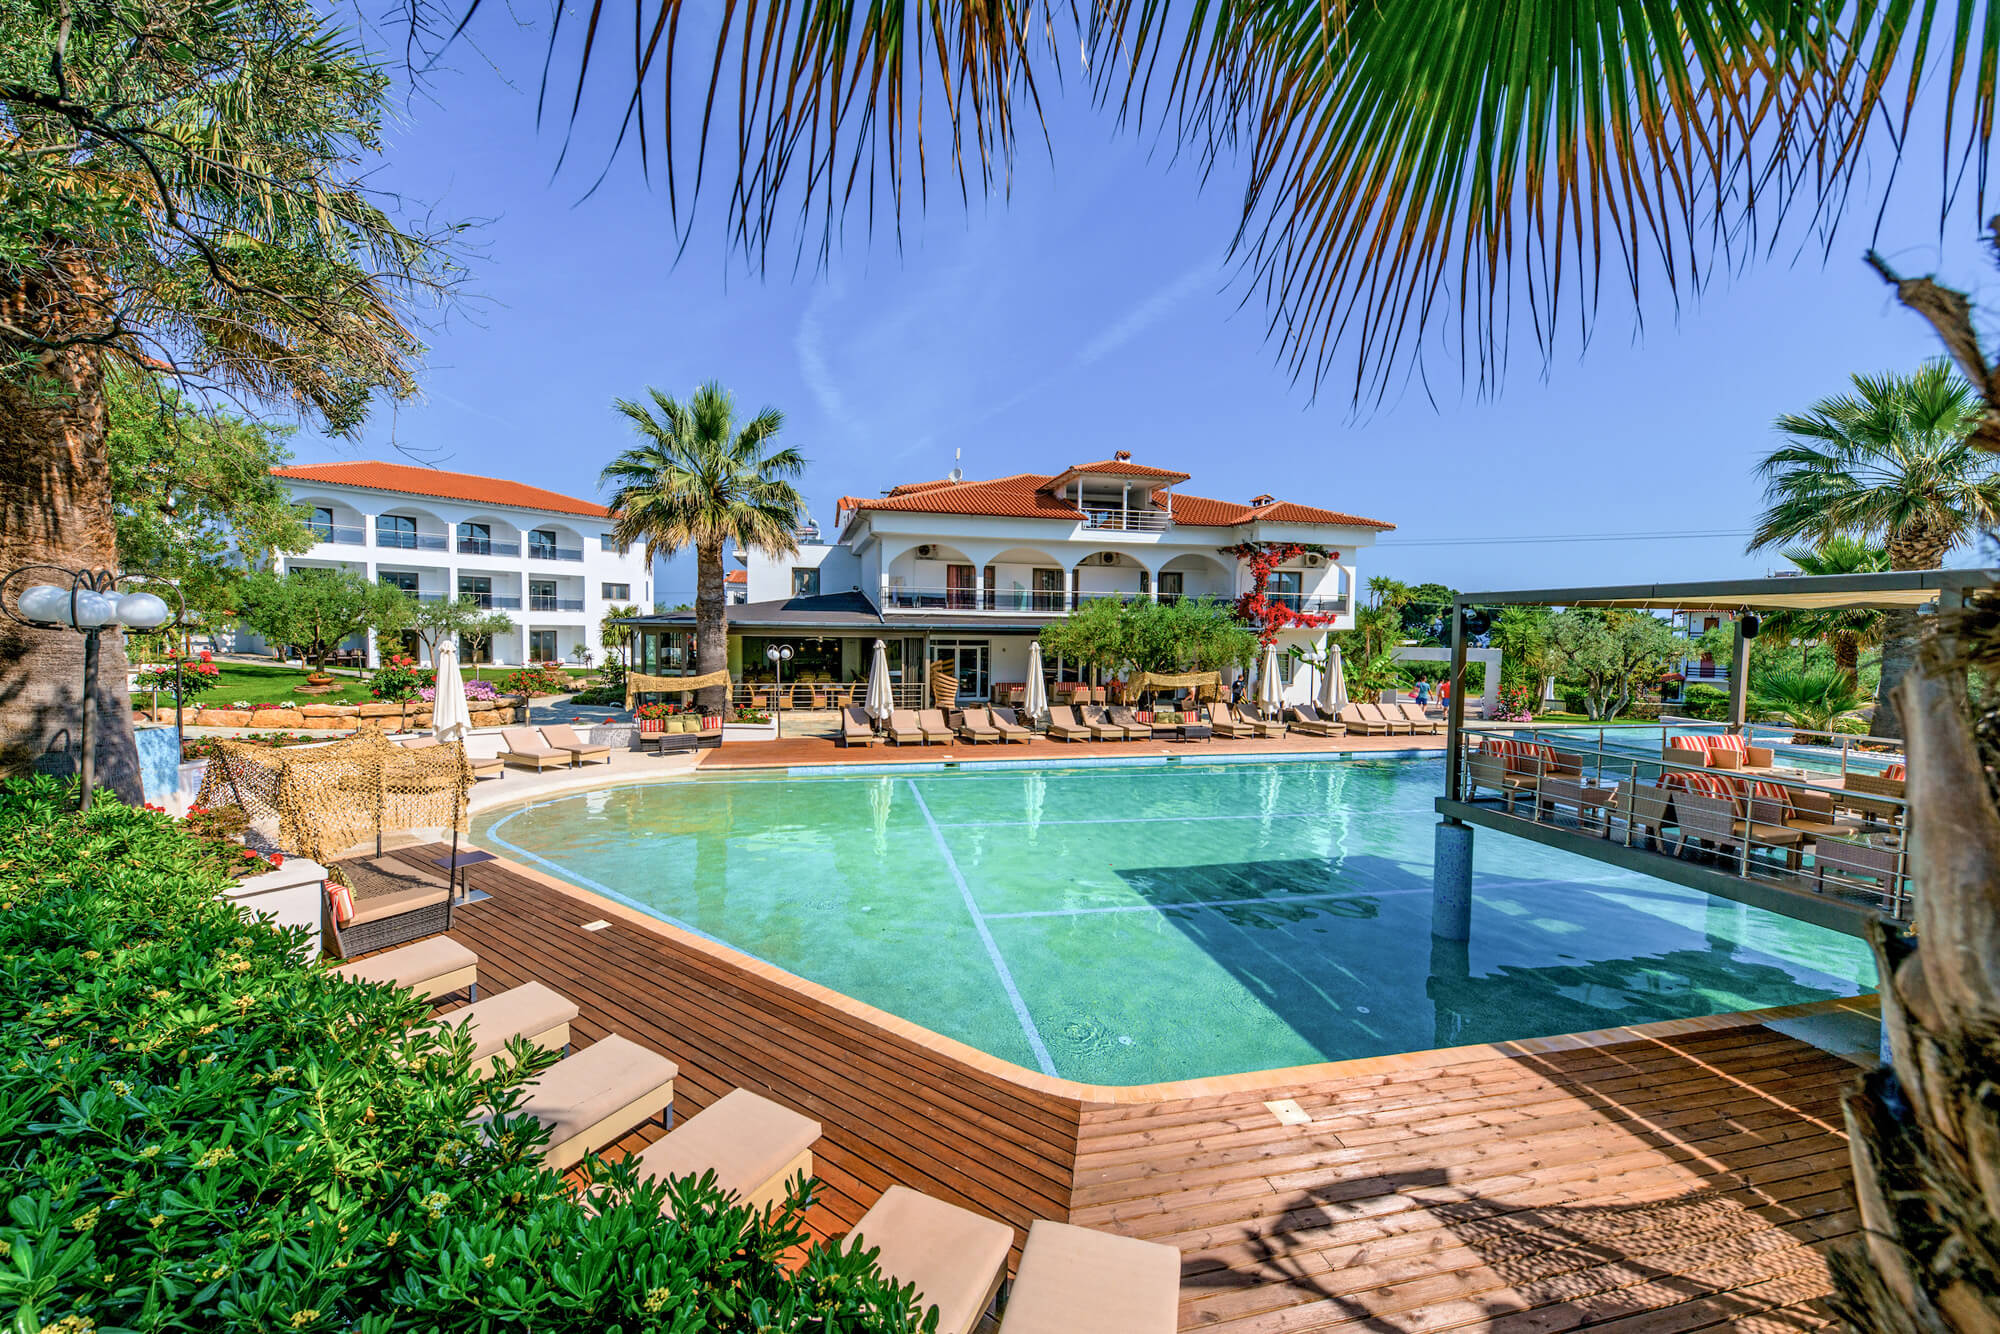 Flegra_Palace pool view_623